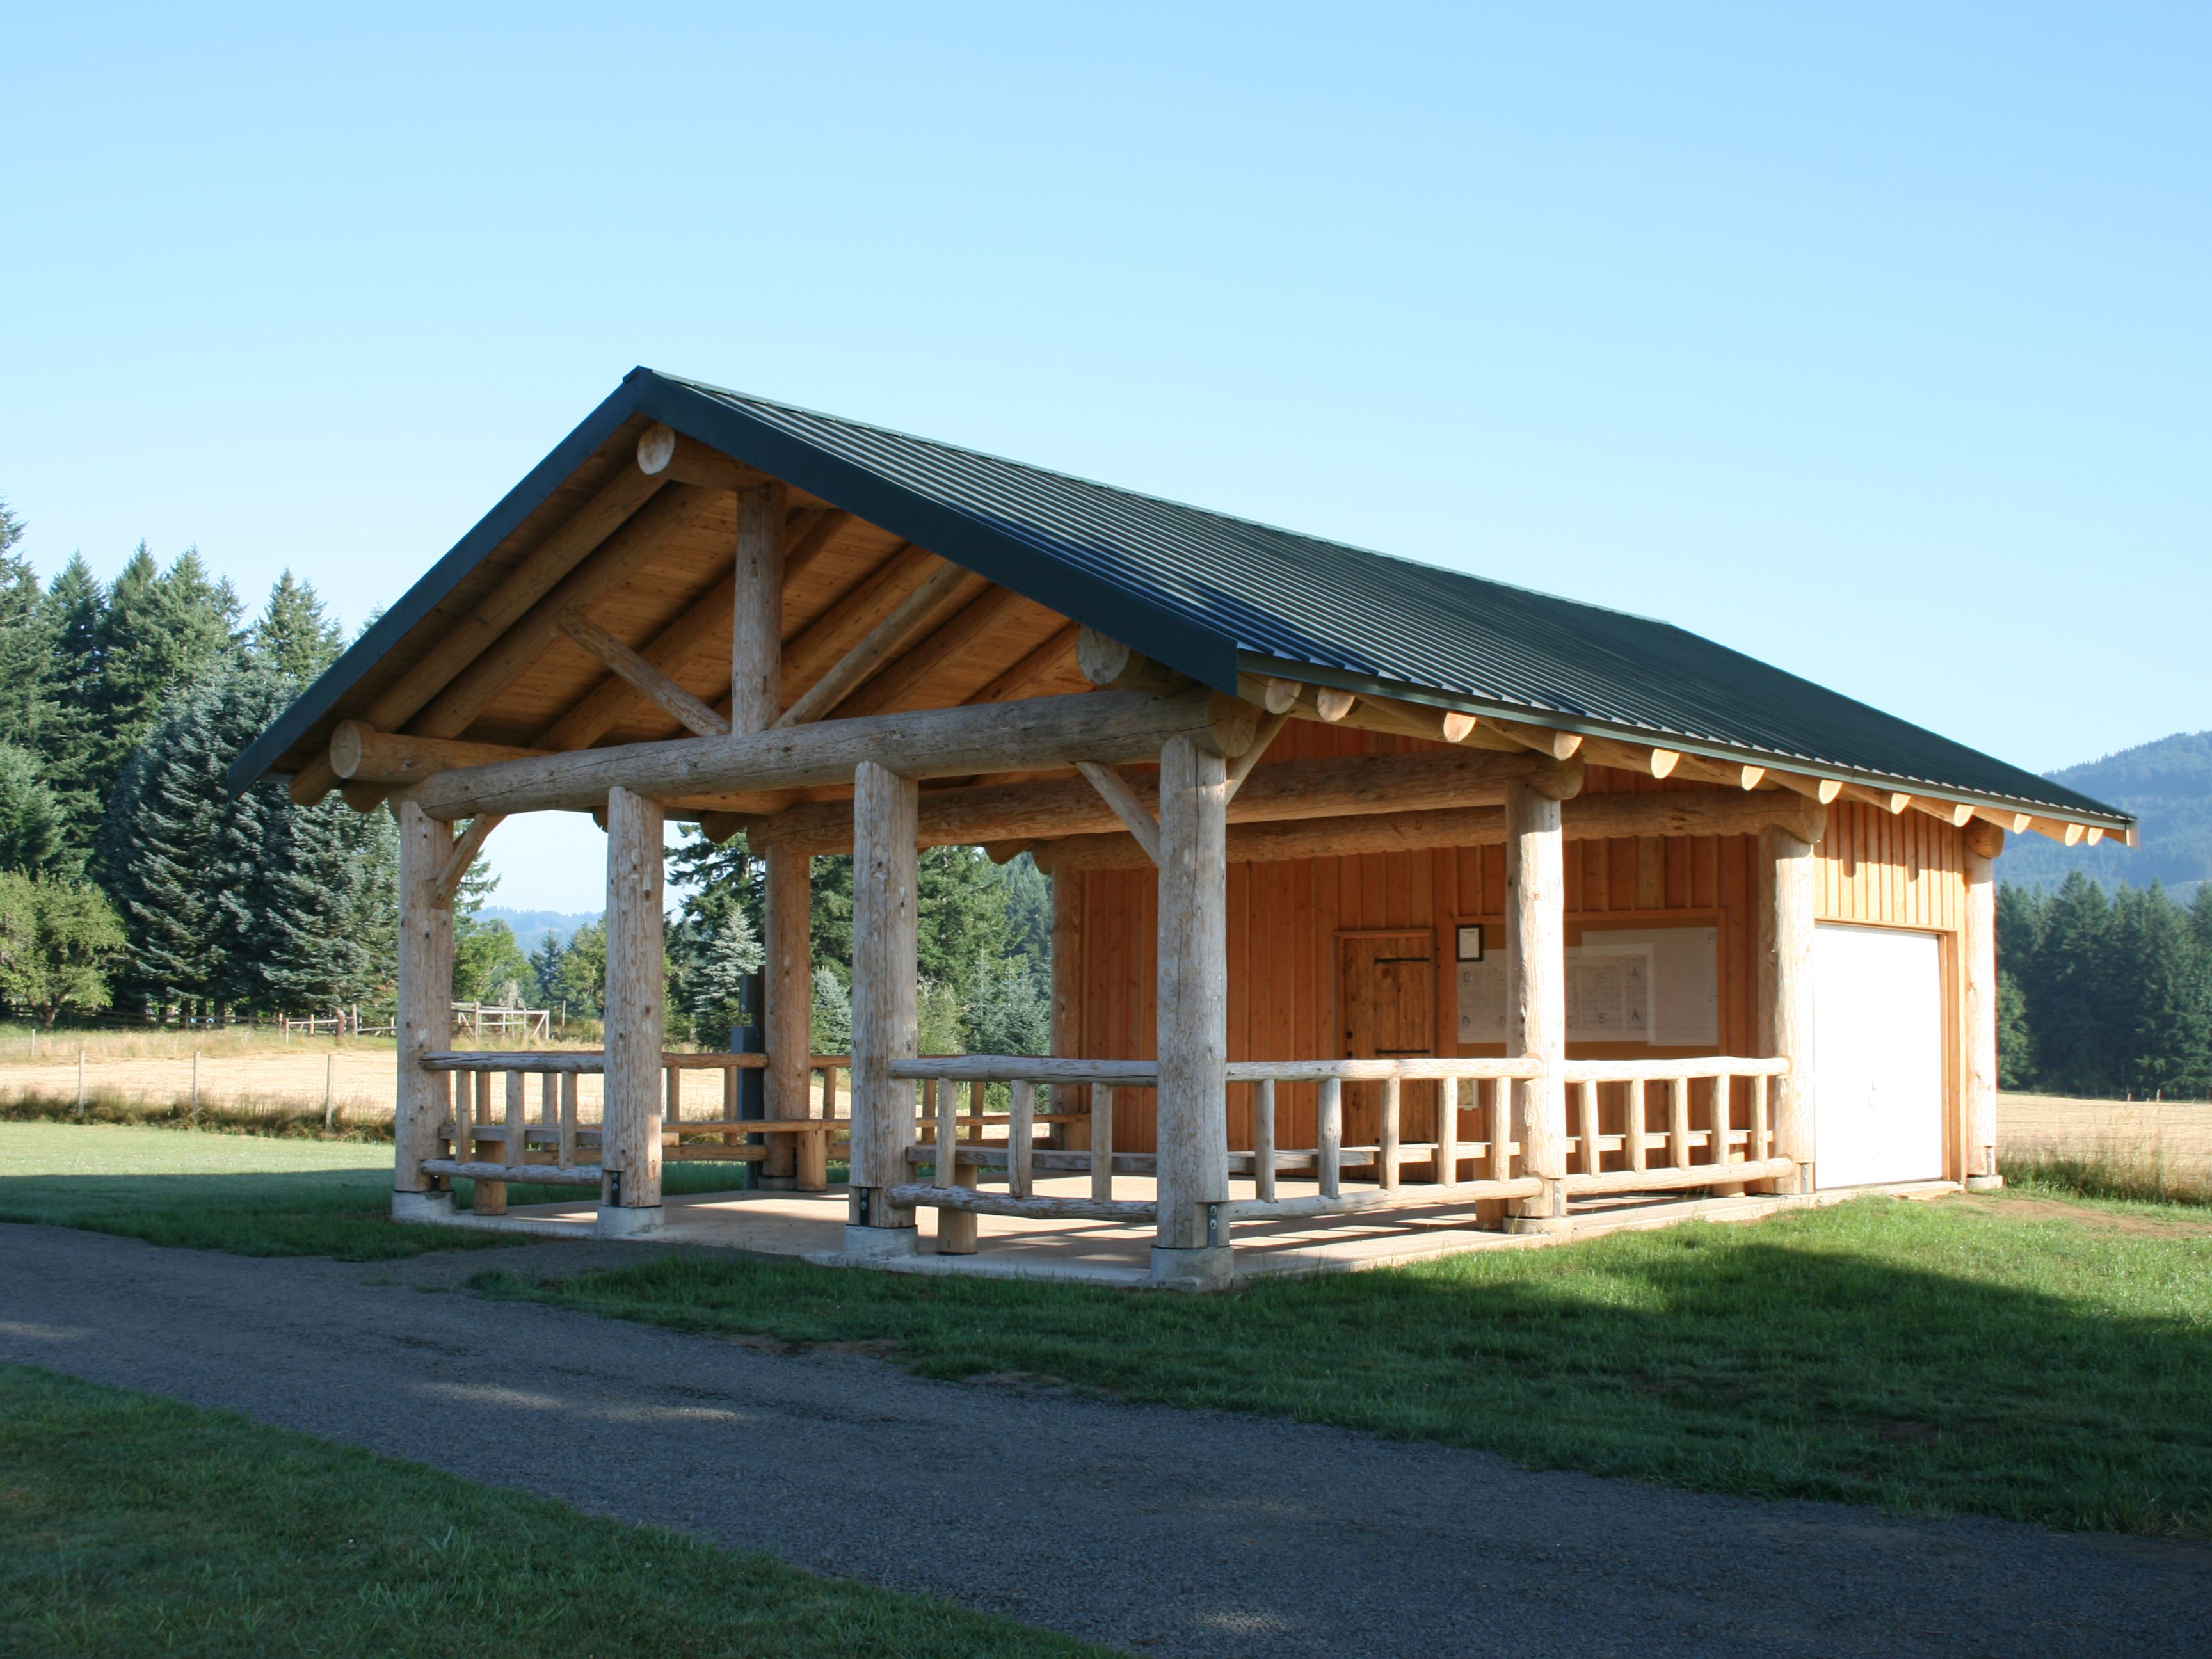 Back Yard Pavilions Shelters Gazebos | Large Log Pavilion ...